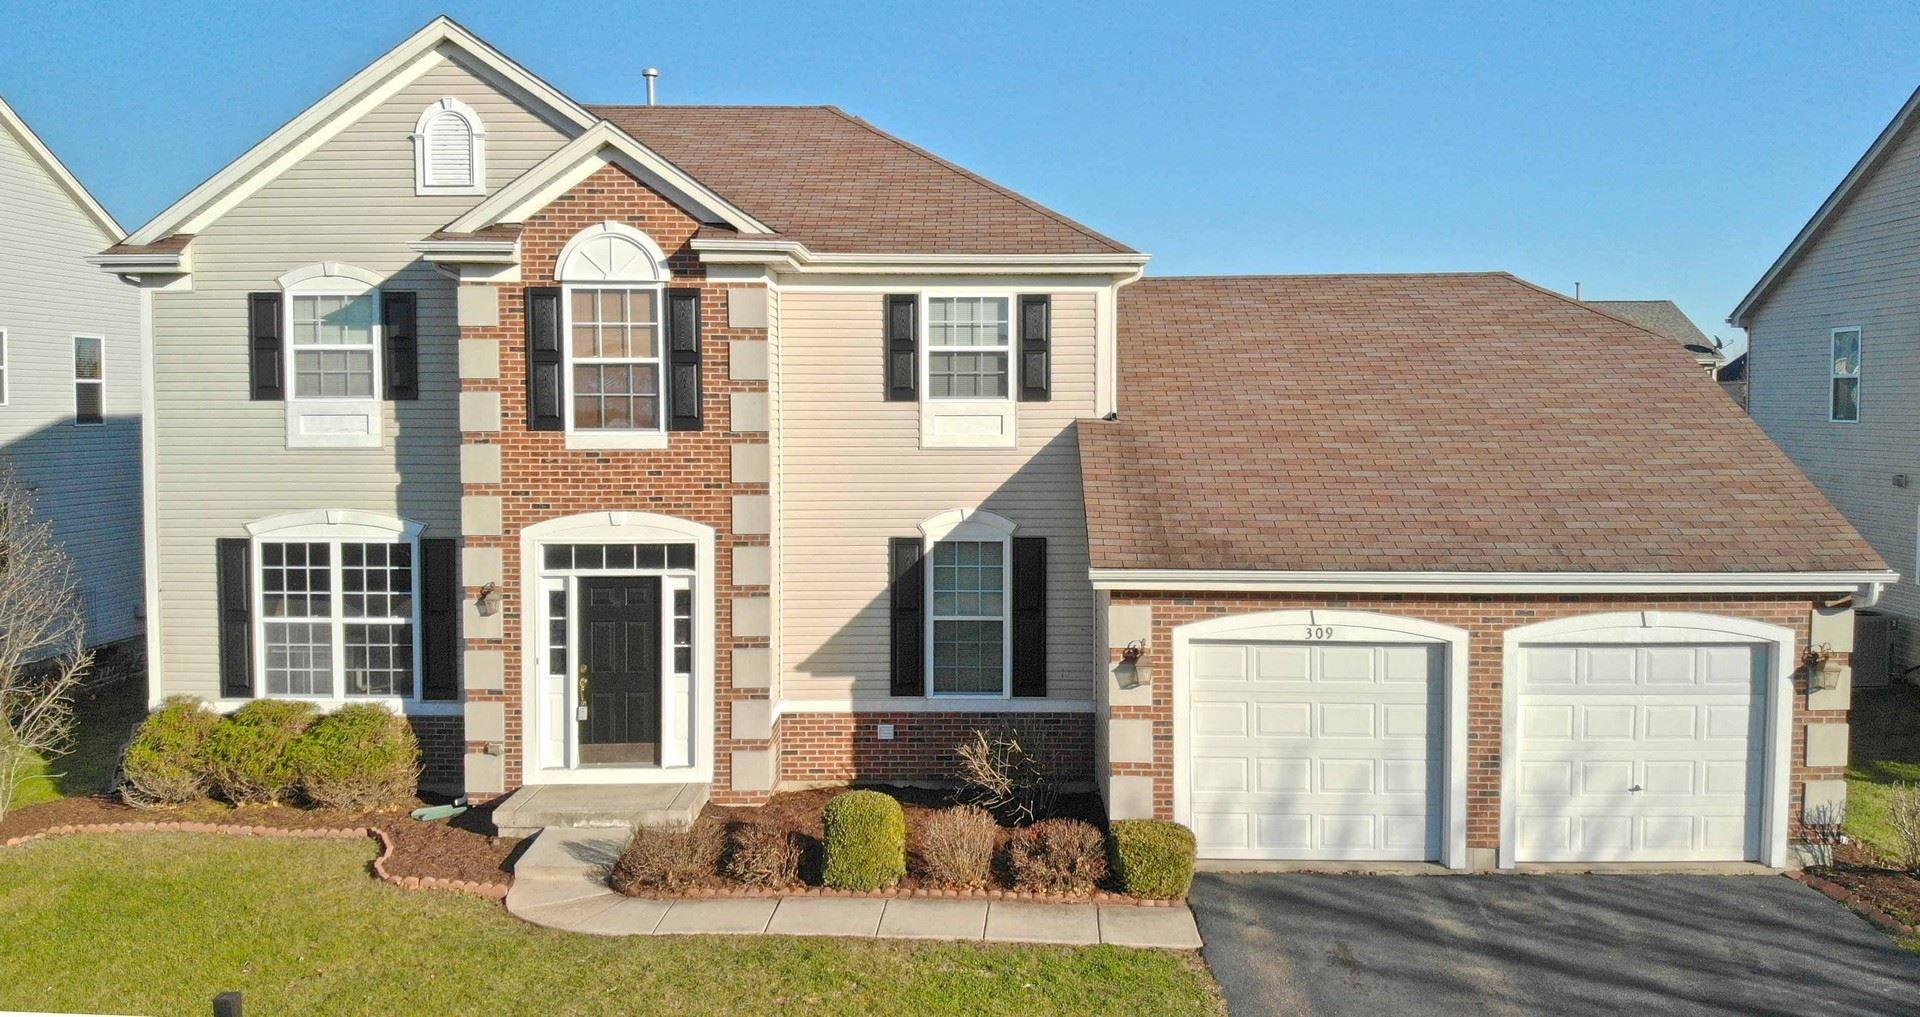 Photo of 309 Hemlock Lane, Oswego, IL 60543 (MLS # 10936488)